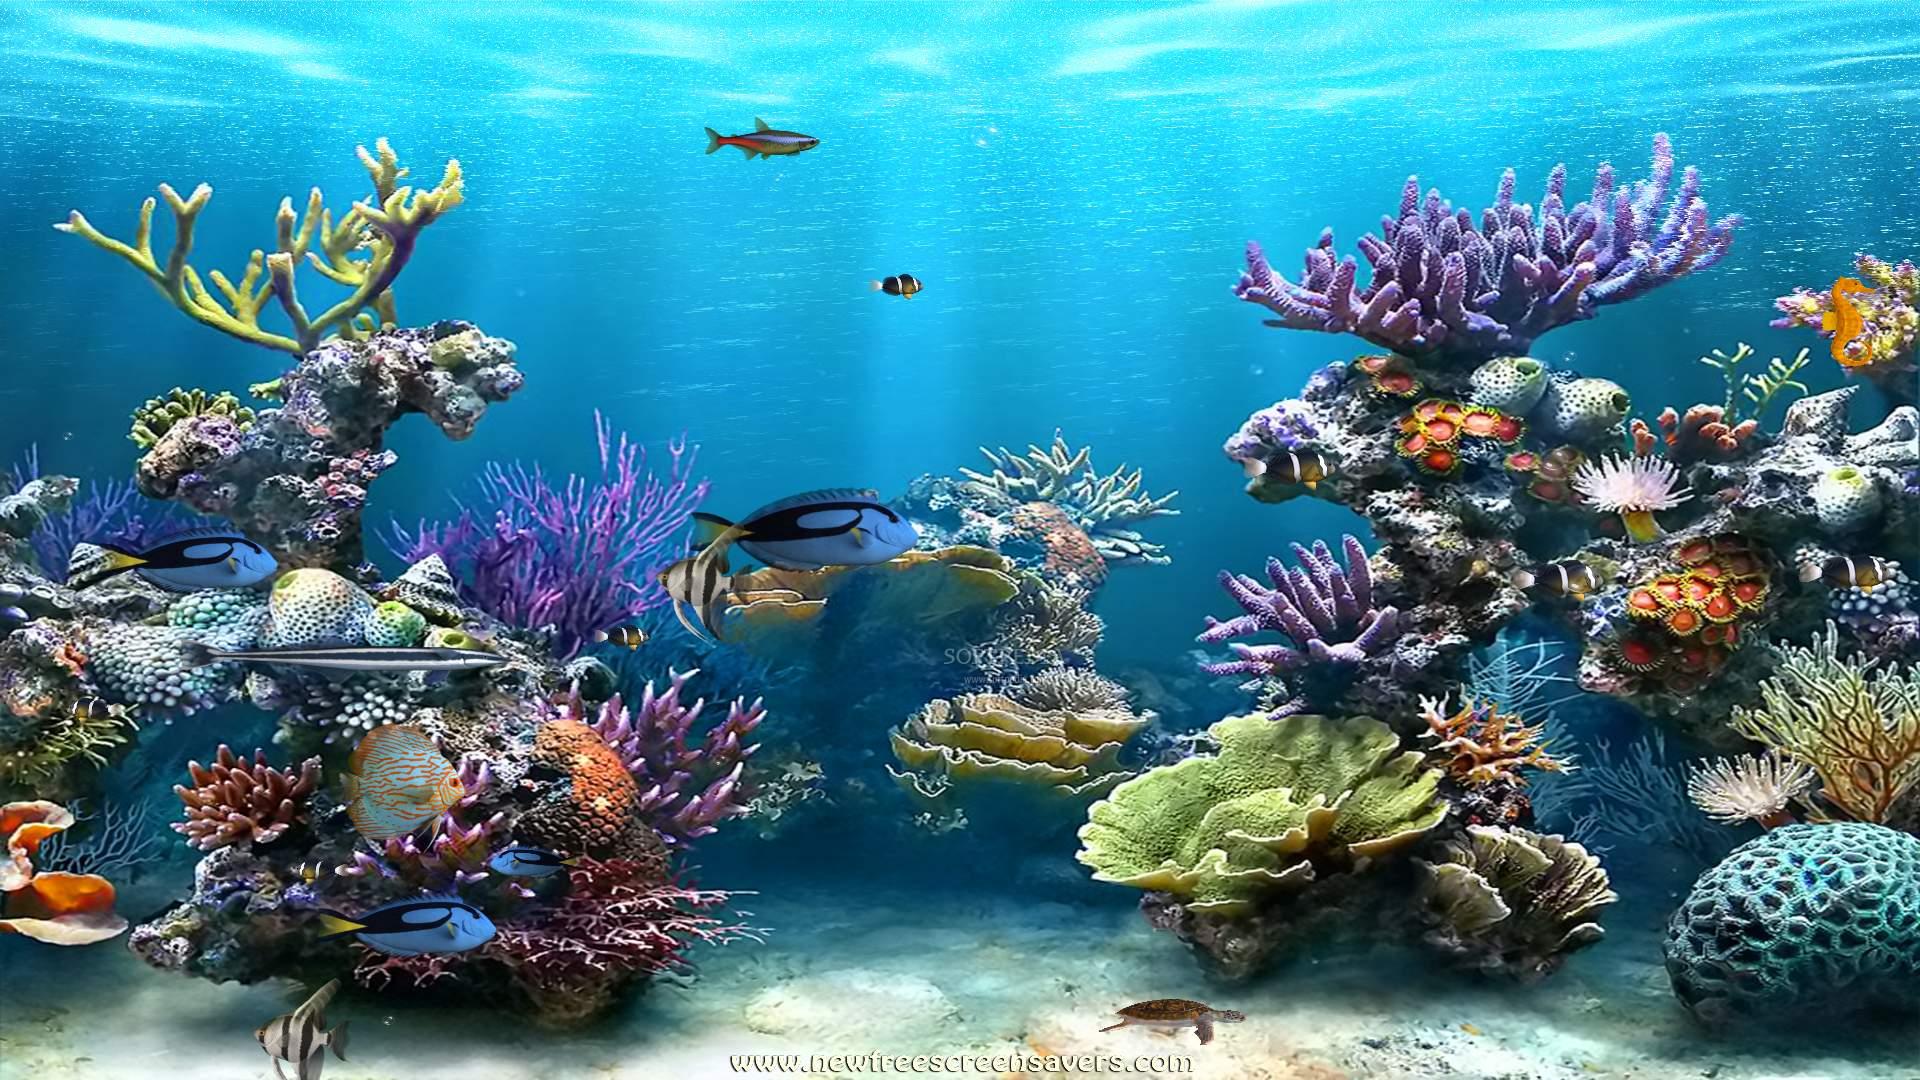 Moving animated ocean screensavers